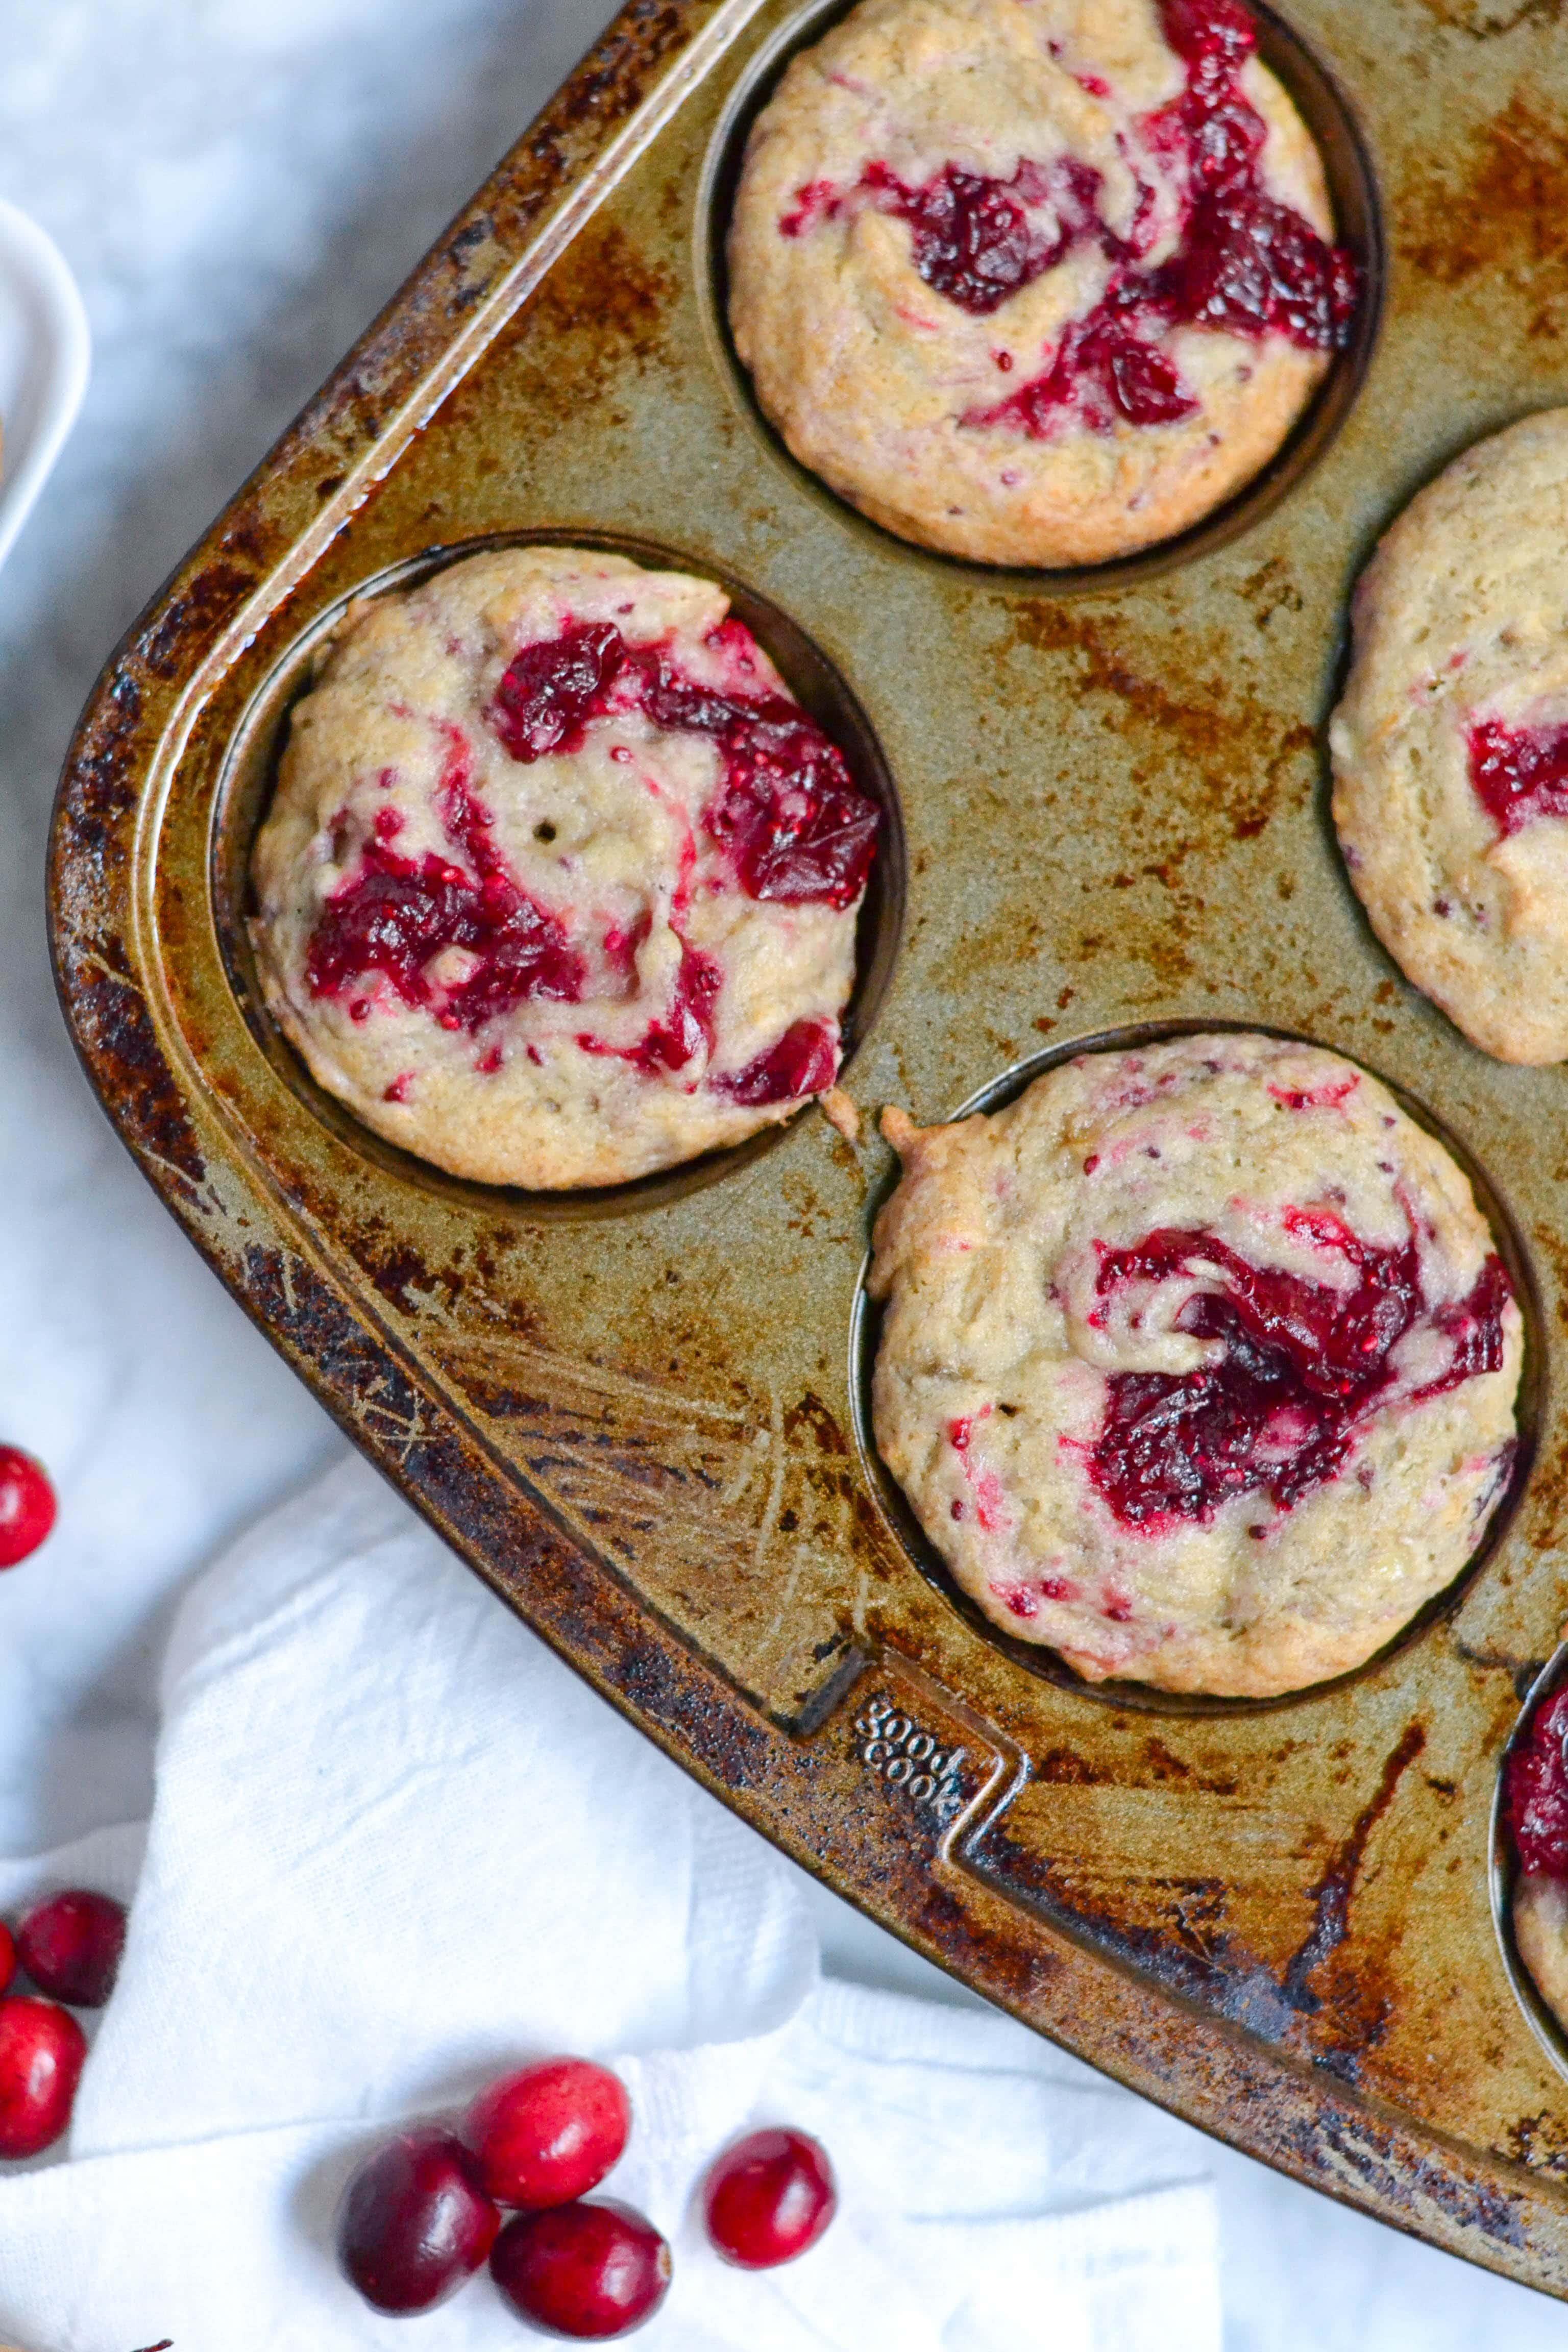 Gluten-Free Vegan Banana Cranberry Jam Muffin (GF, DF, V) - A Dash of Megnut